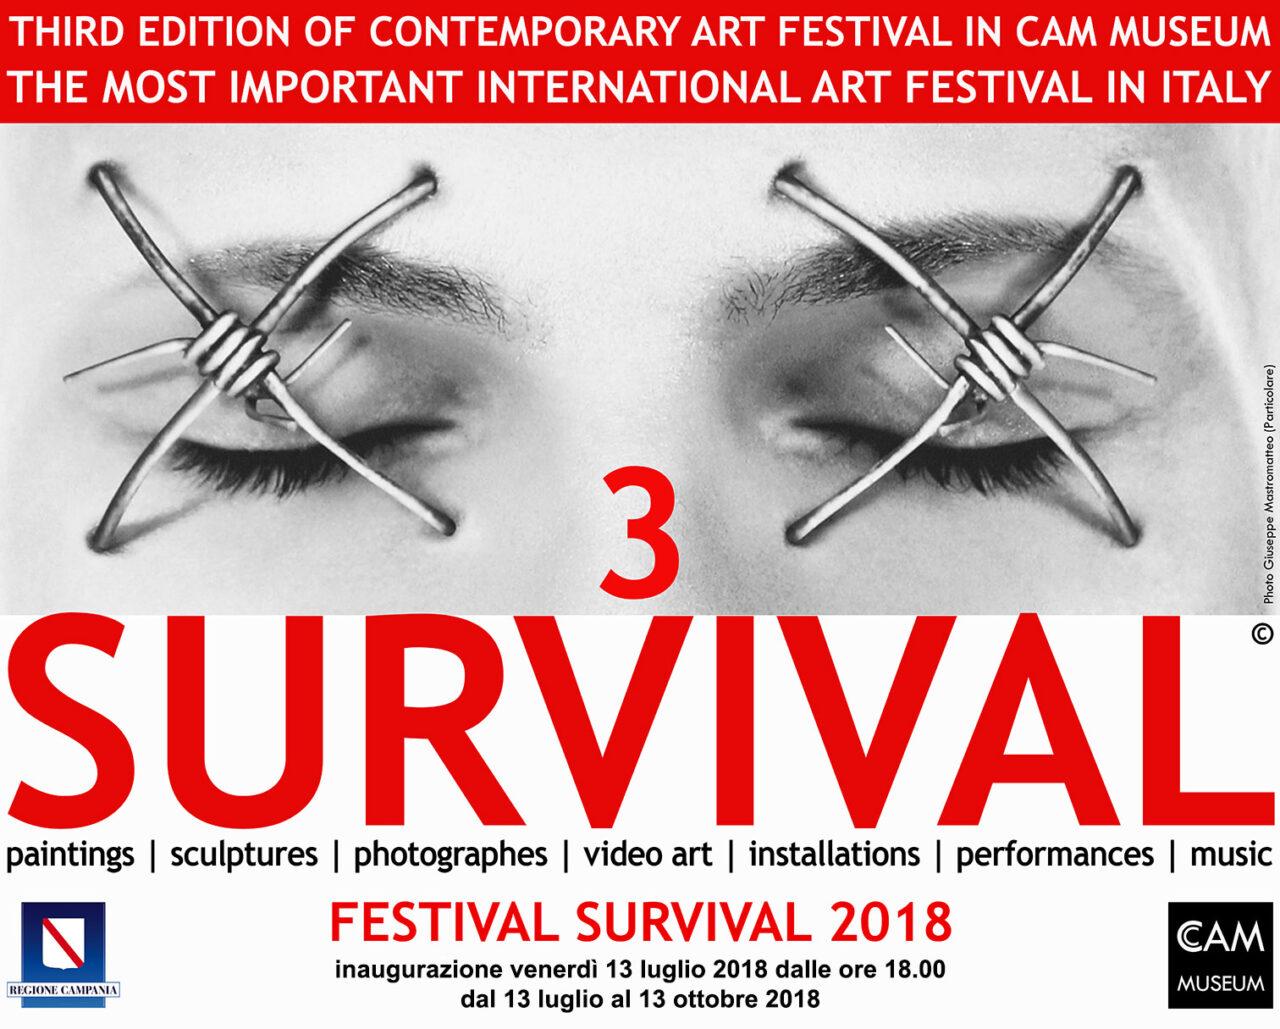 FESTIVAL SURVIVAL 2018